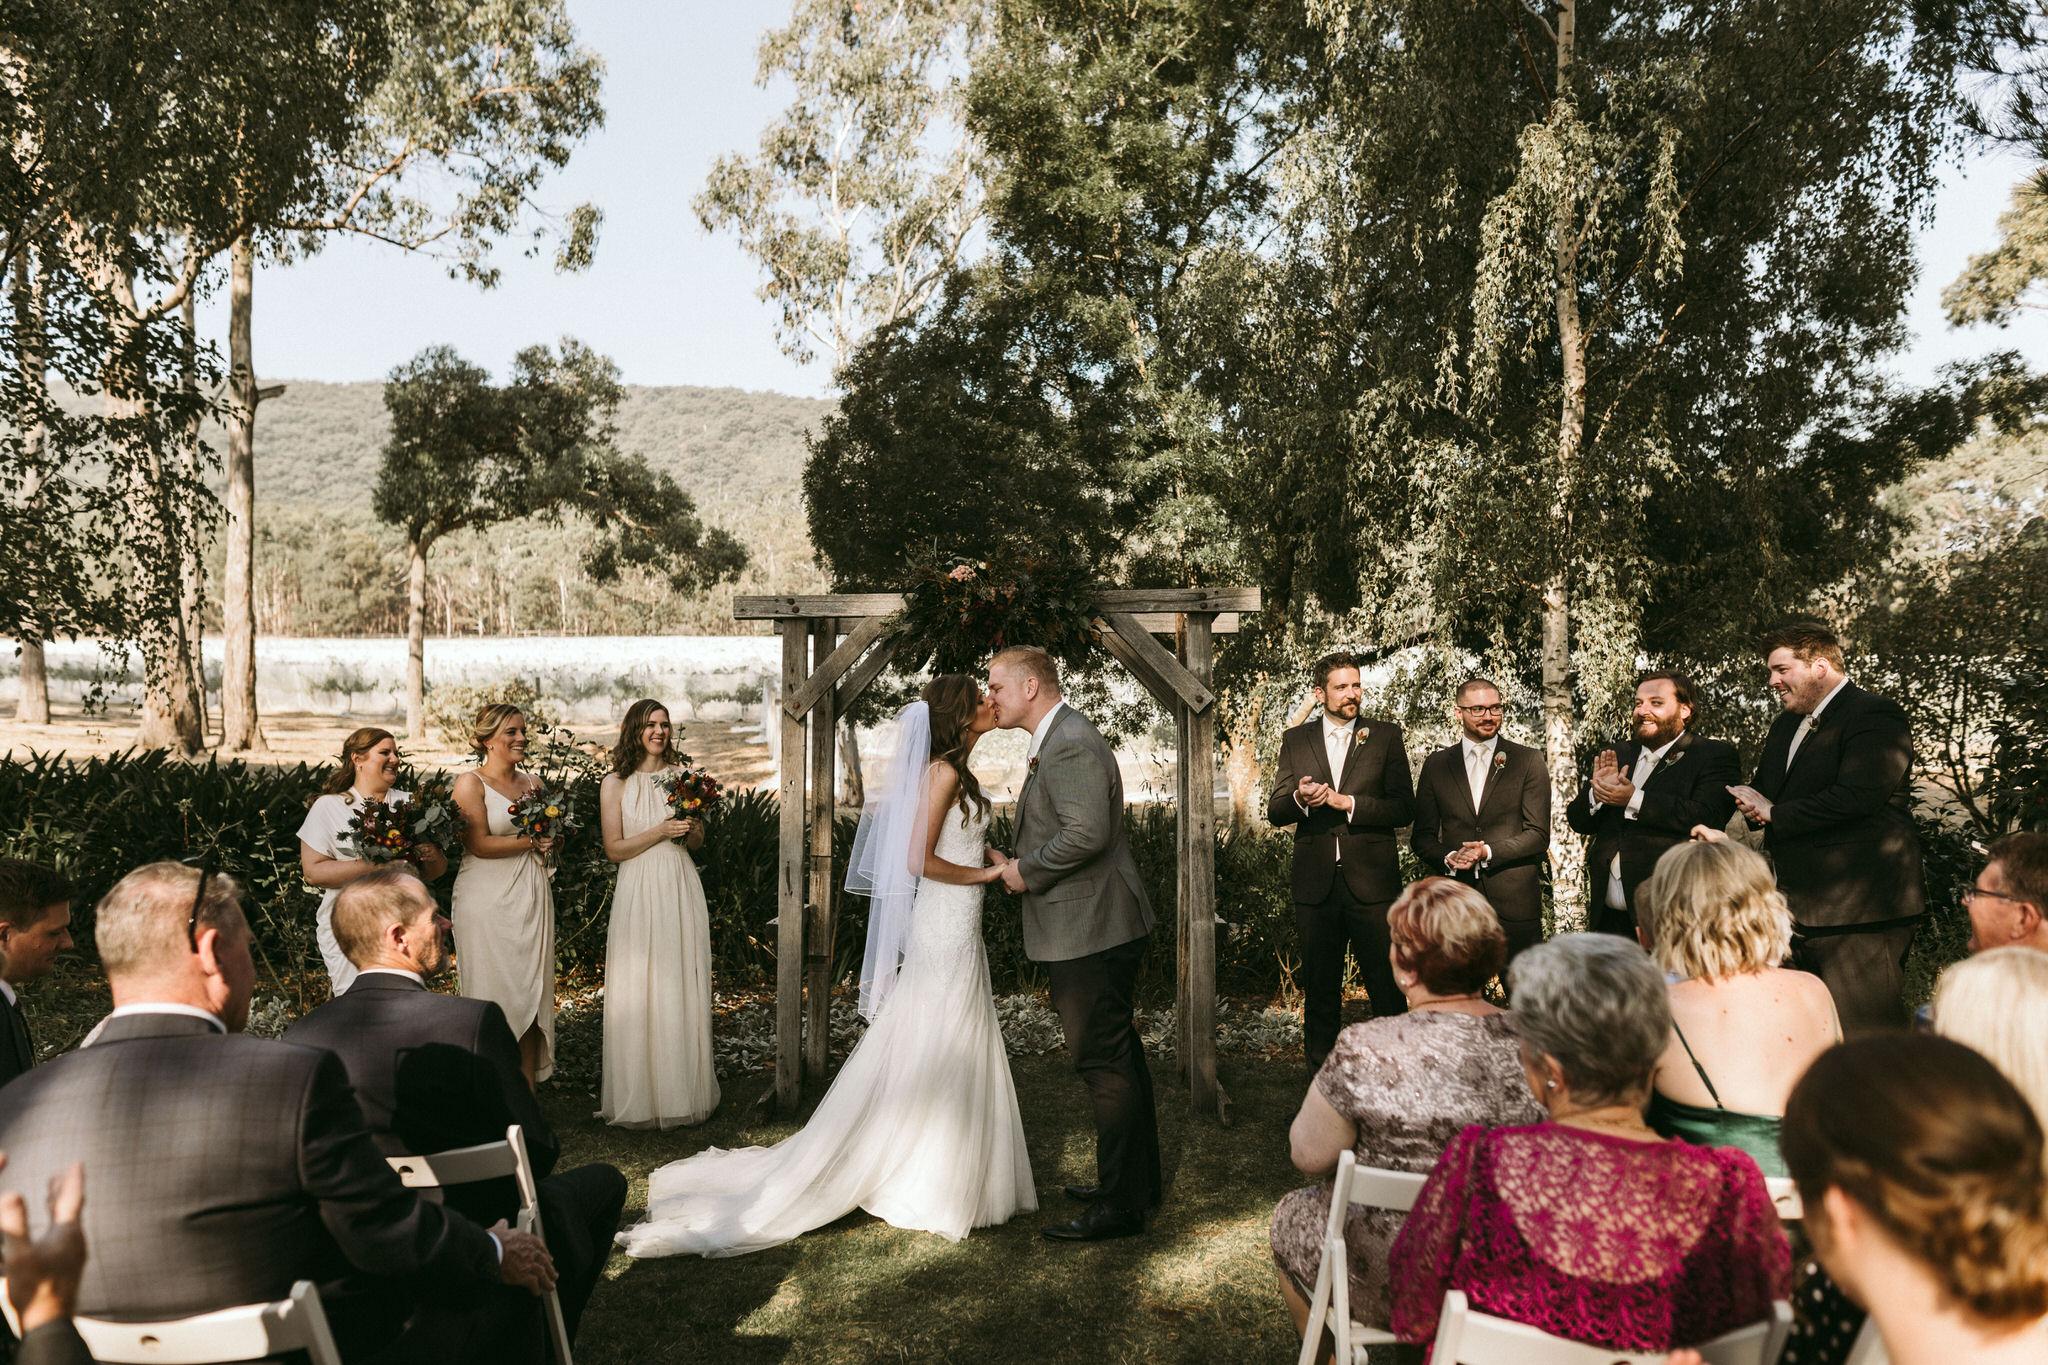 Catherine&Wade_04_Ceremony_LR-147.jpg